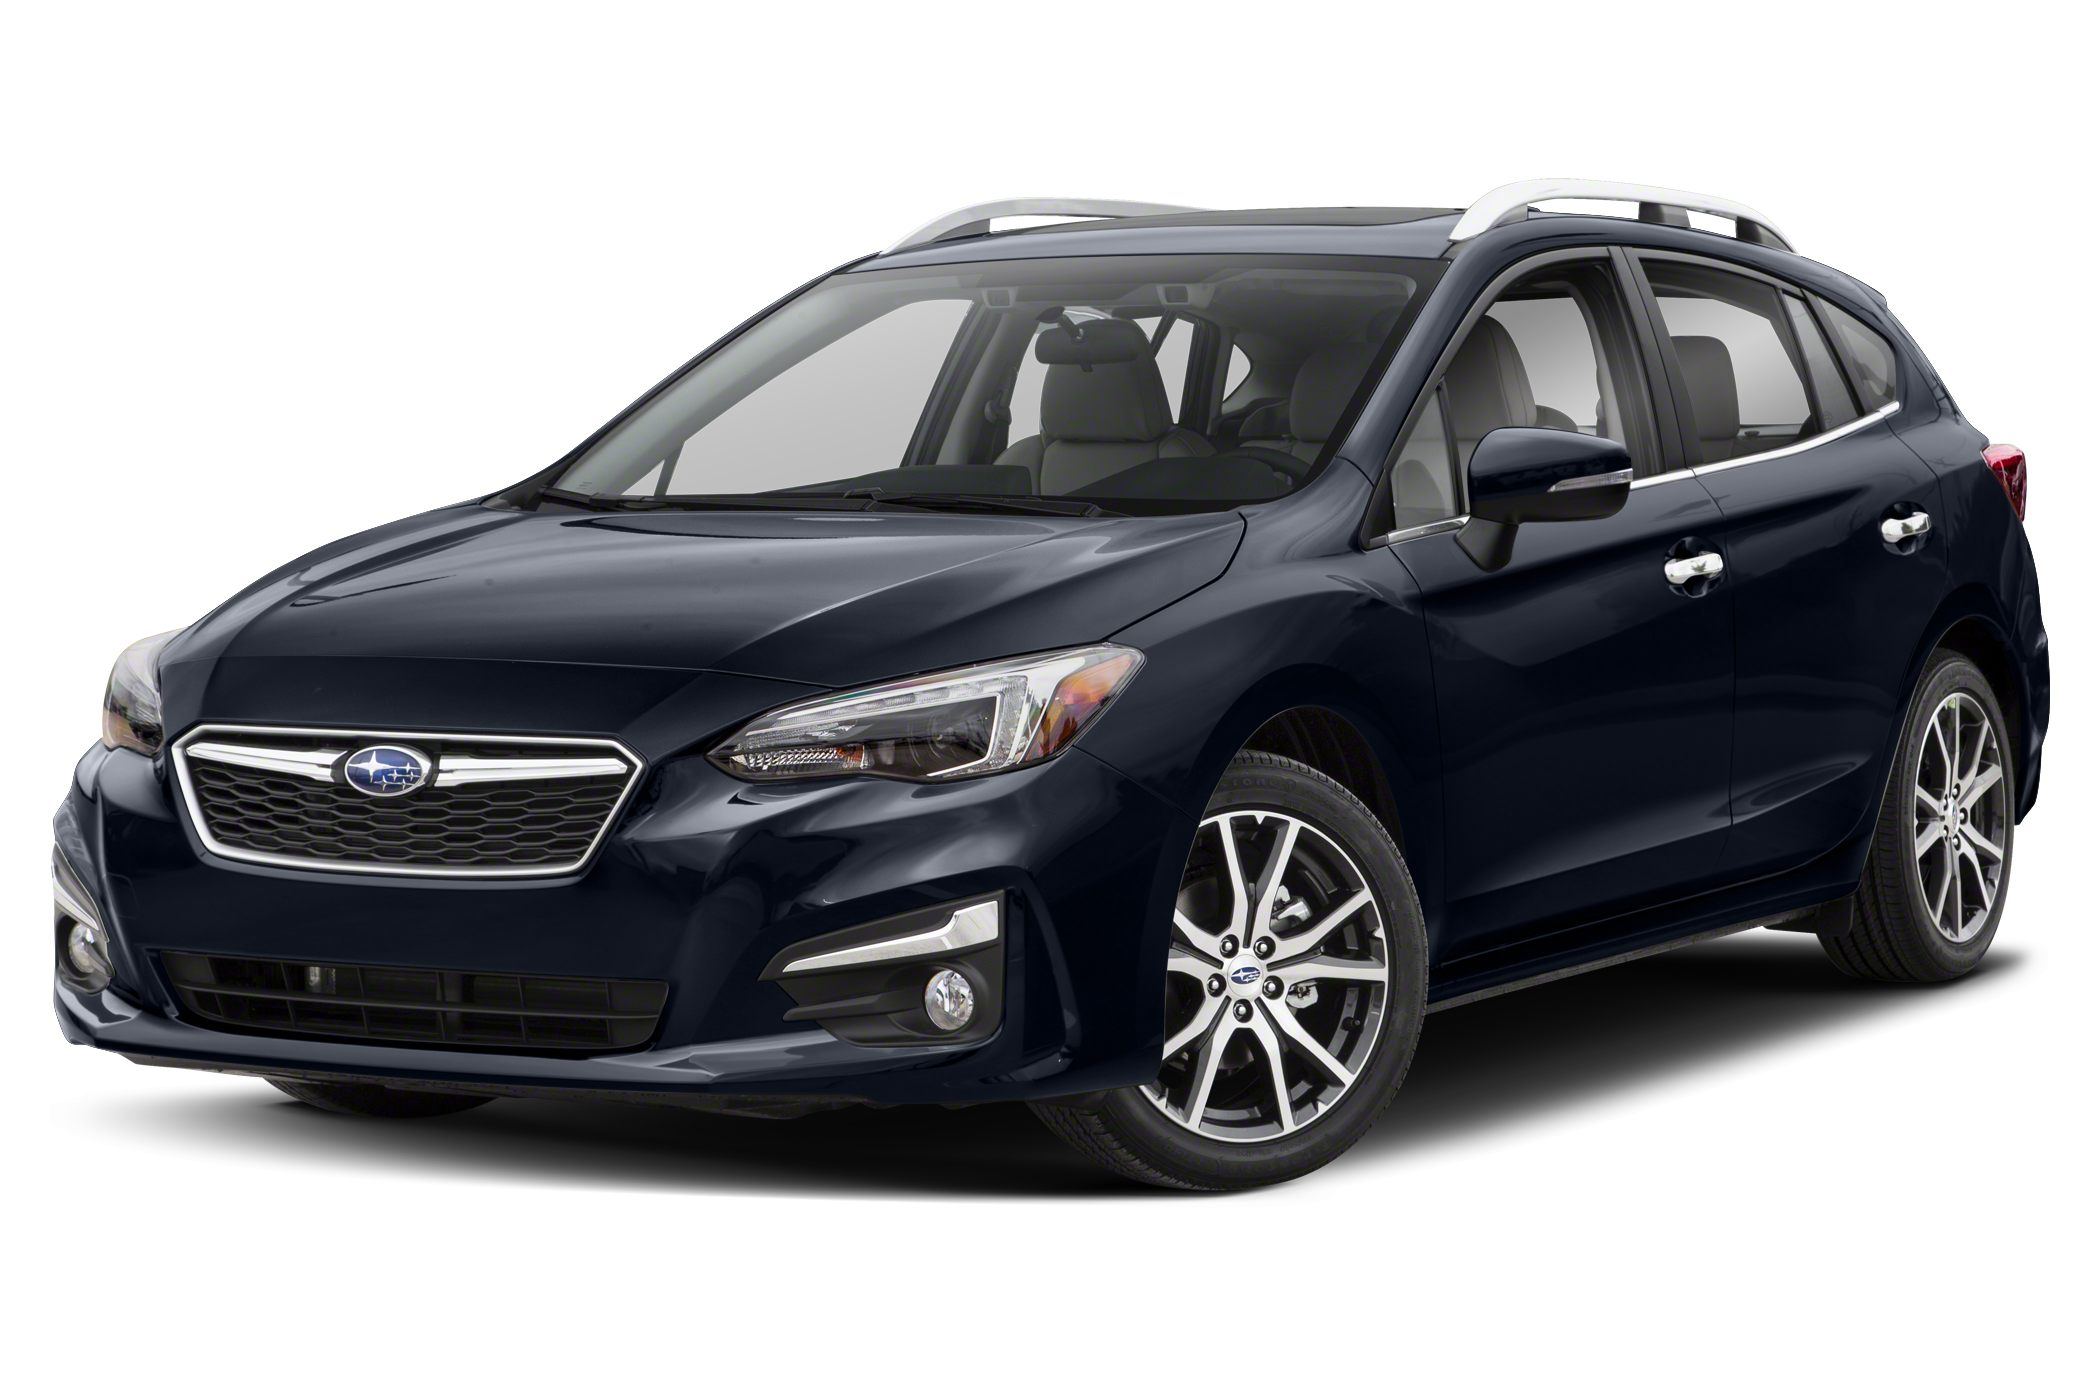 2019 Subaru Impreza 2.0i Limited 4dr All-wheel Drive Hatchback